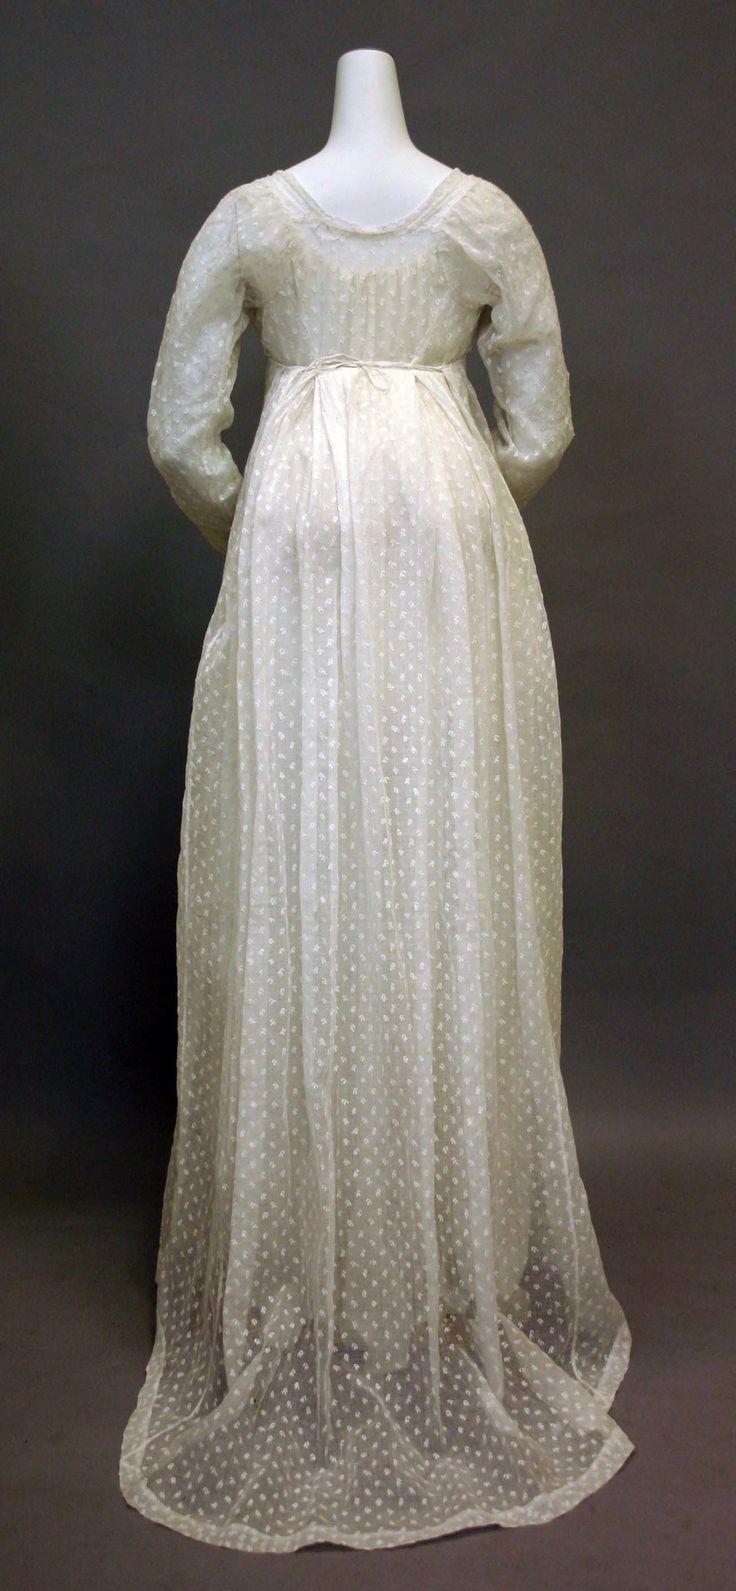 best apparel regency images on pinterest regency era